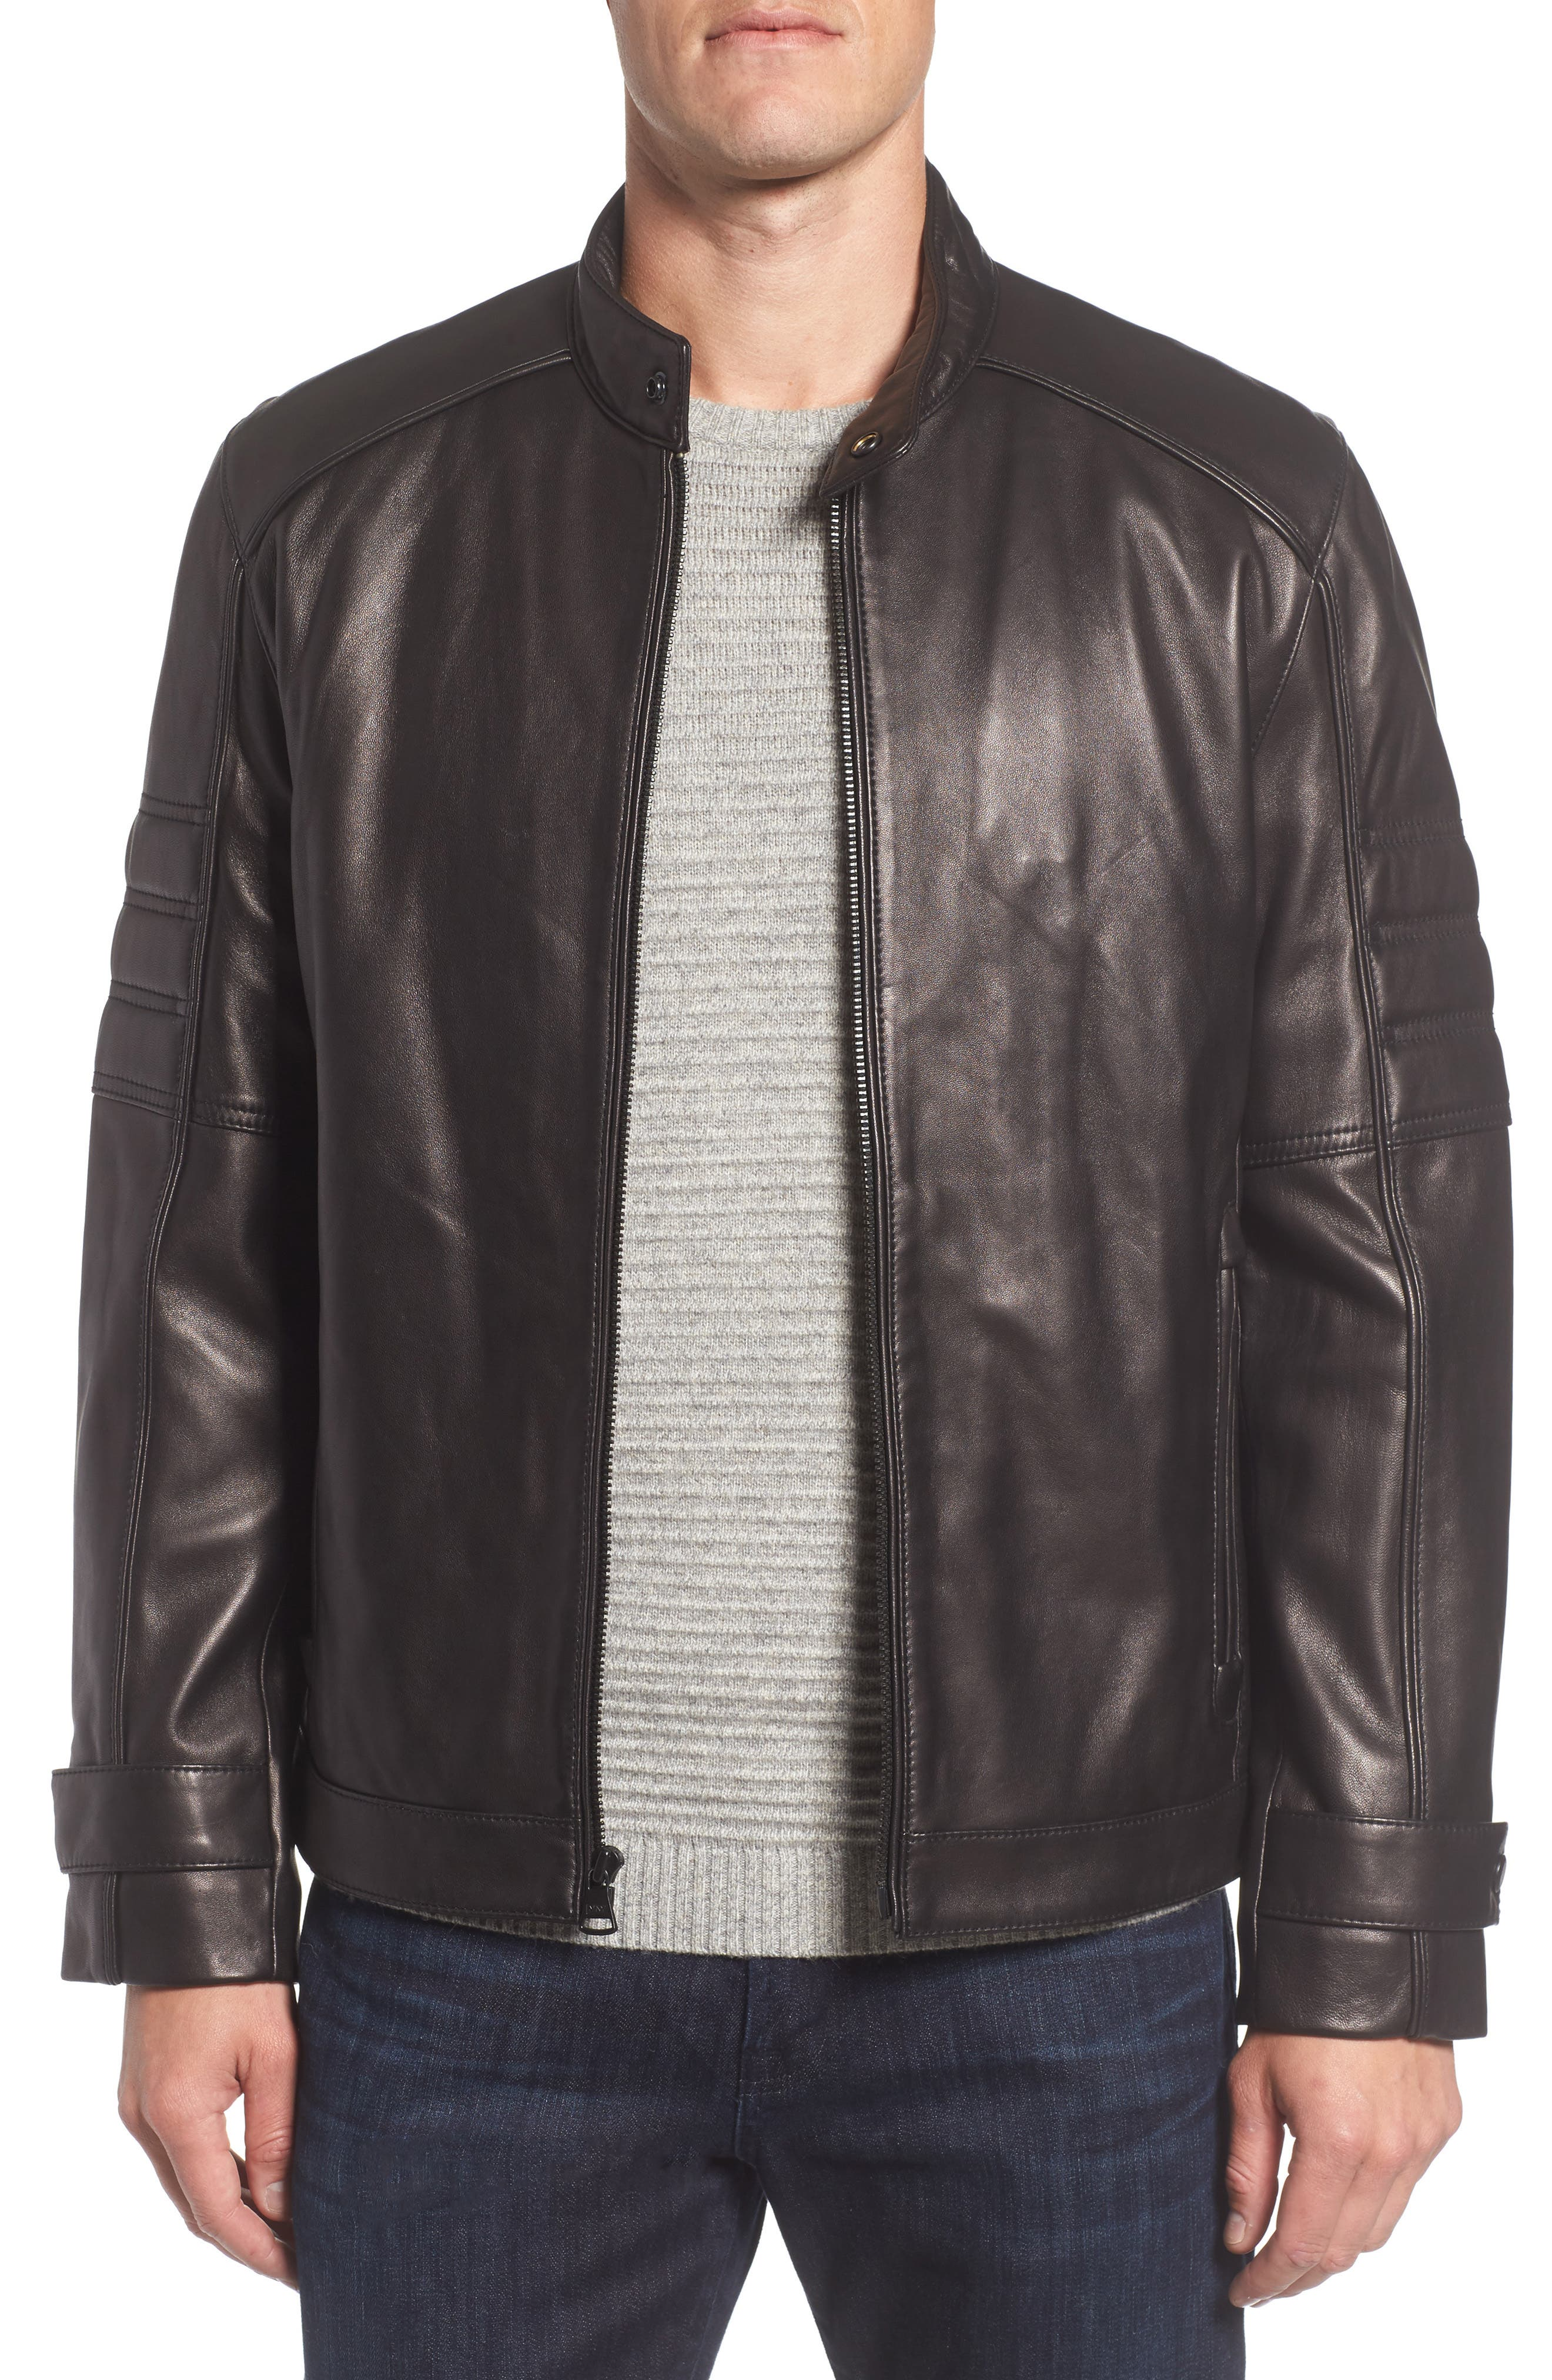 Alternate Image 1 Selected - Marc New York Tuers Lambskin Leather Moto Jacket